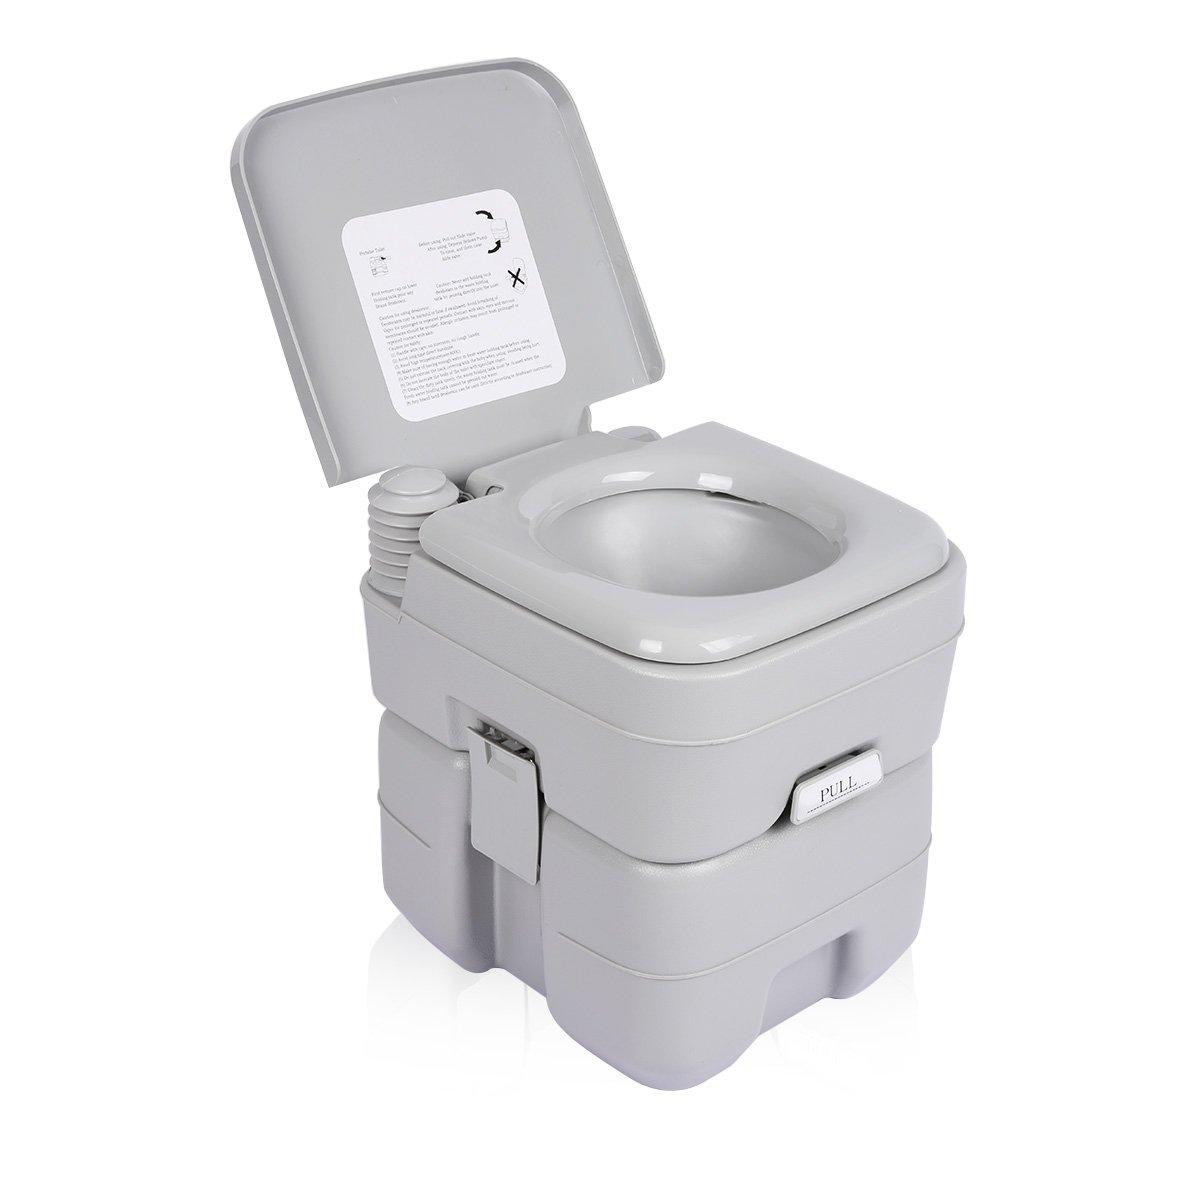 Amazon.com: Excelvan 5.3 Gallon 20L Flush Portable Potti Outdoor ...